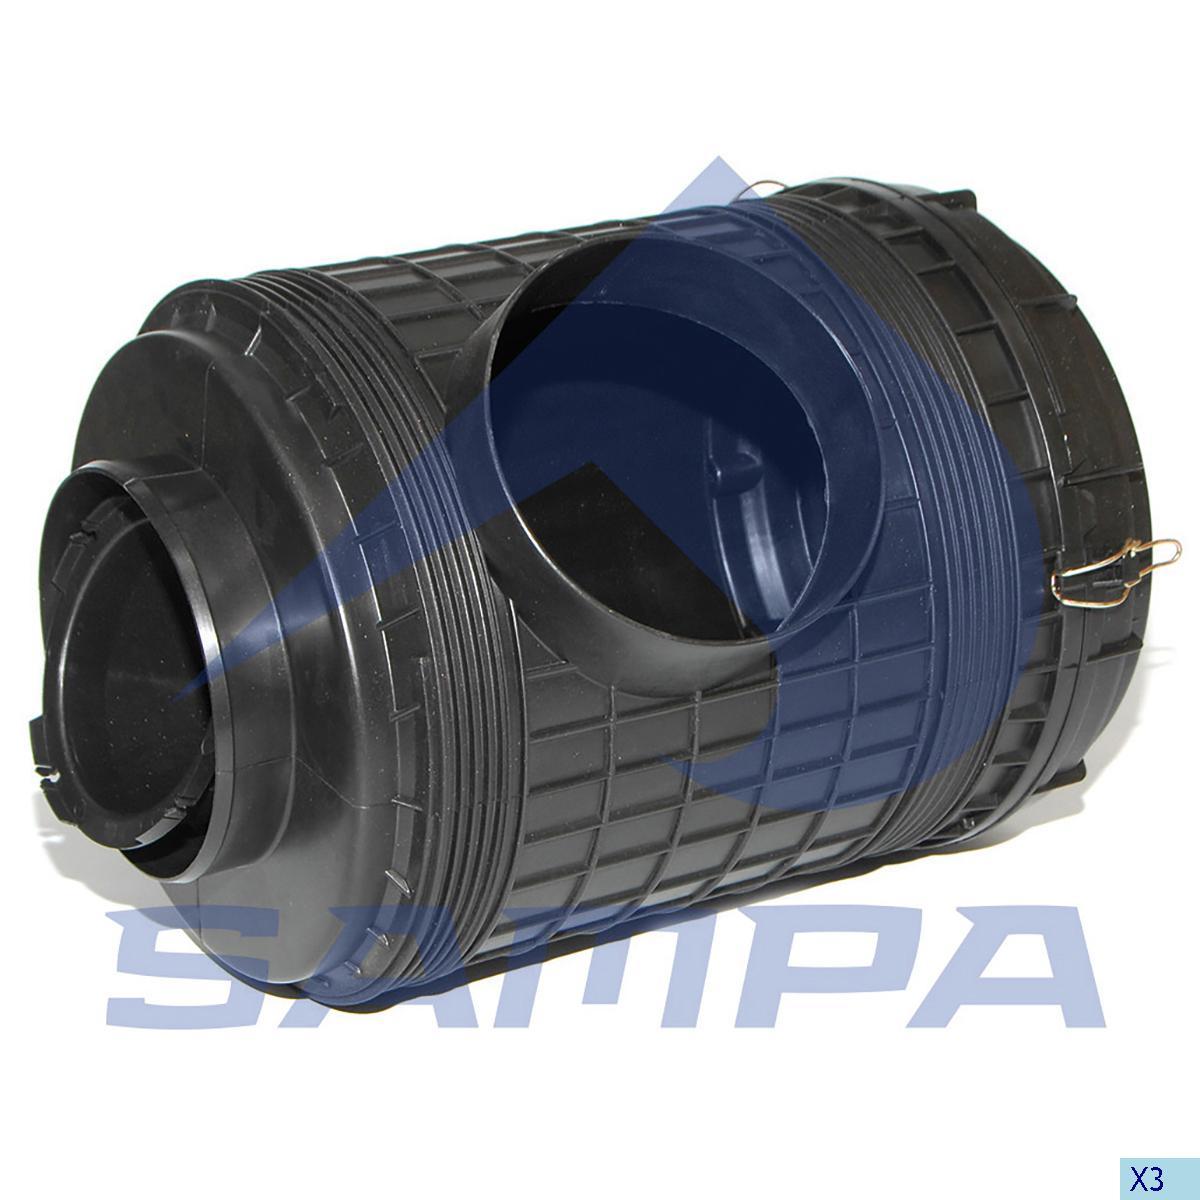 Housing, Air Filter, R.V.I., Engine